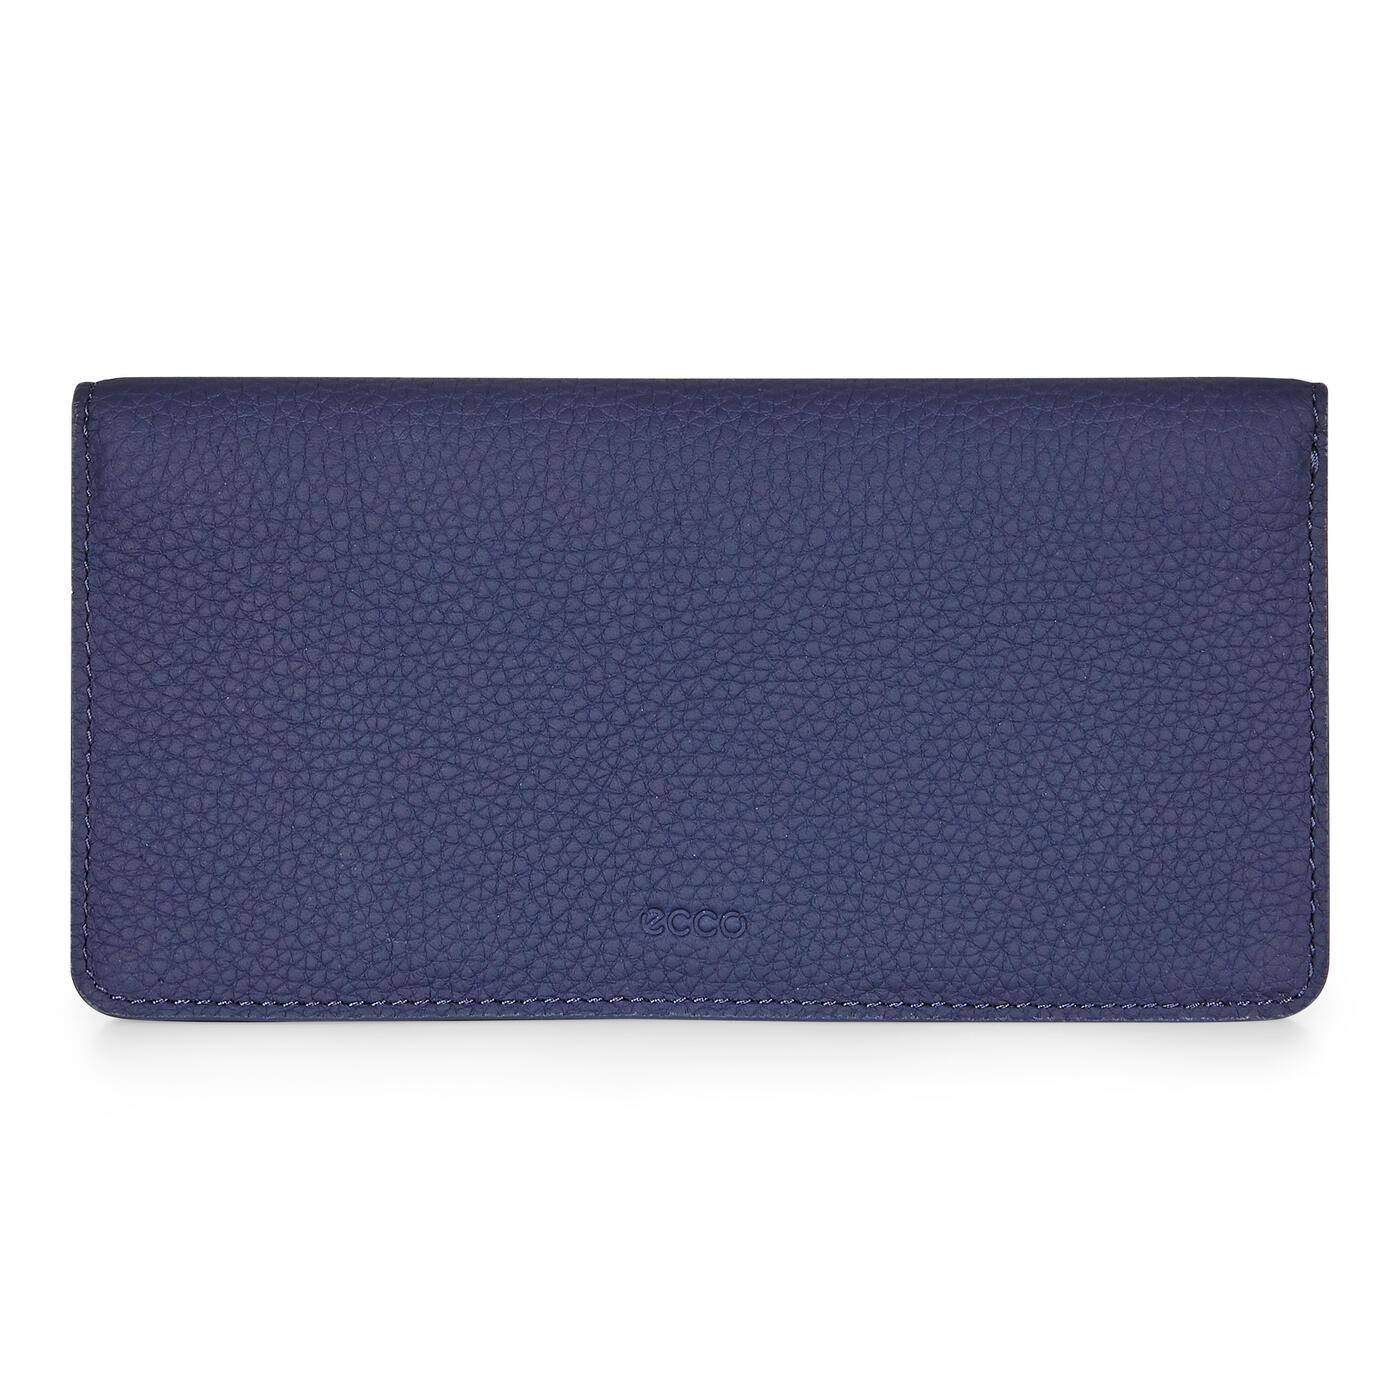 ECCO Jilin Large Wallet